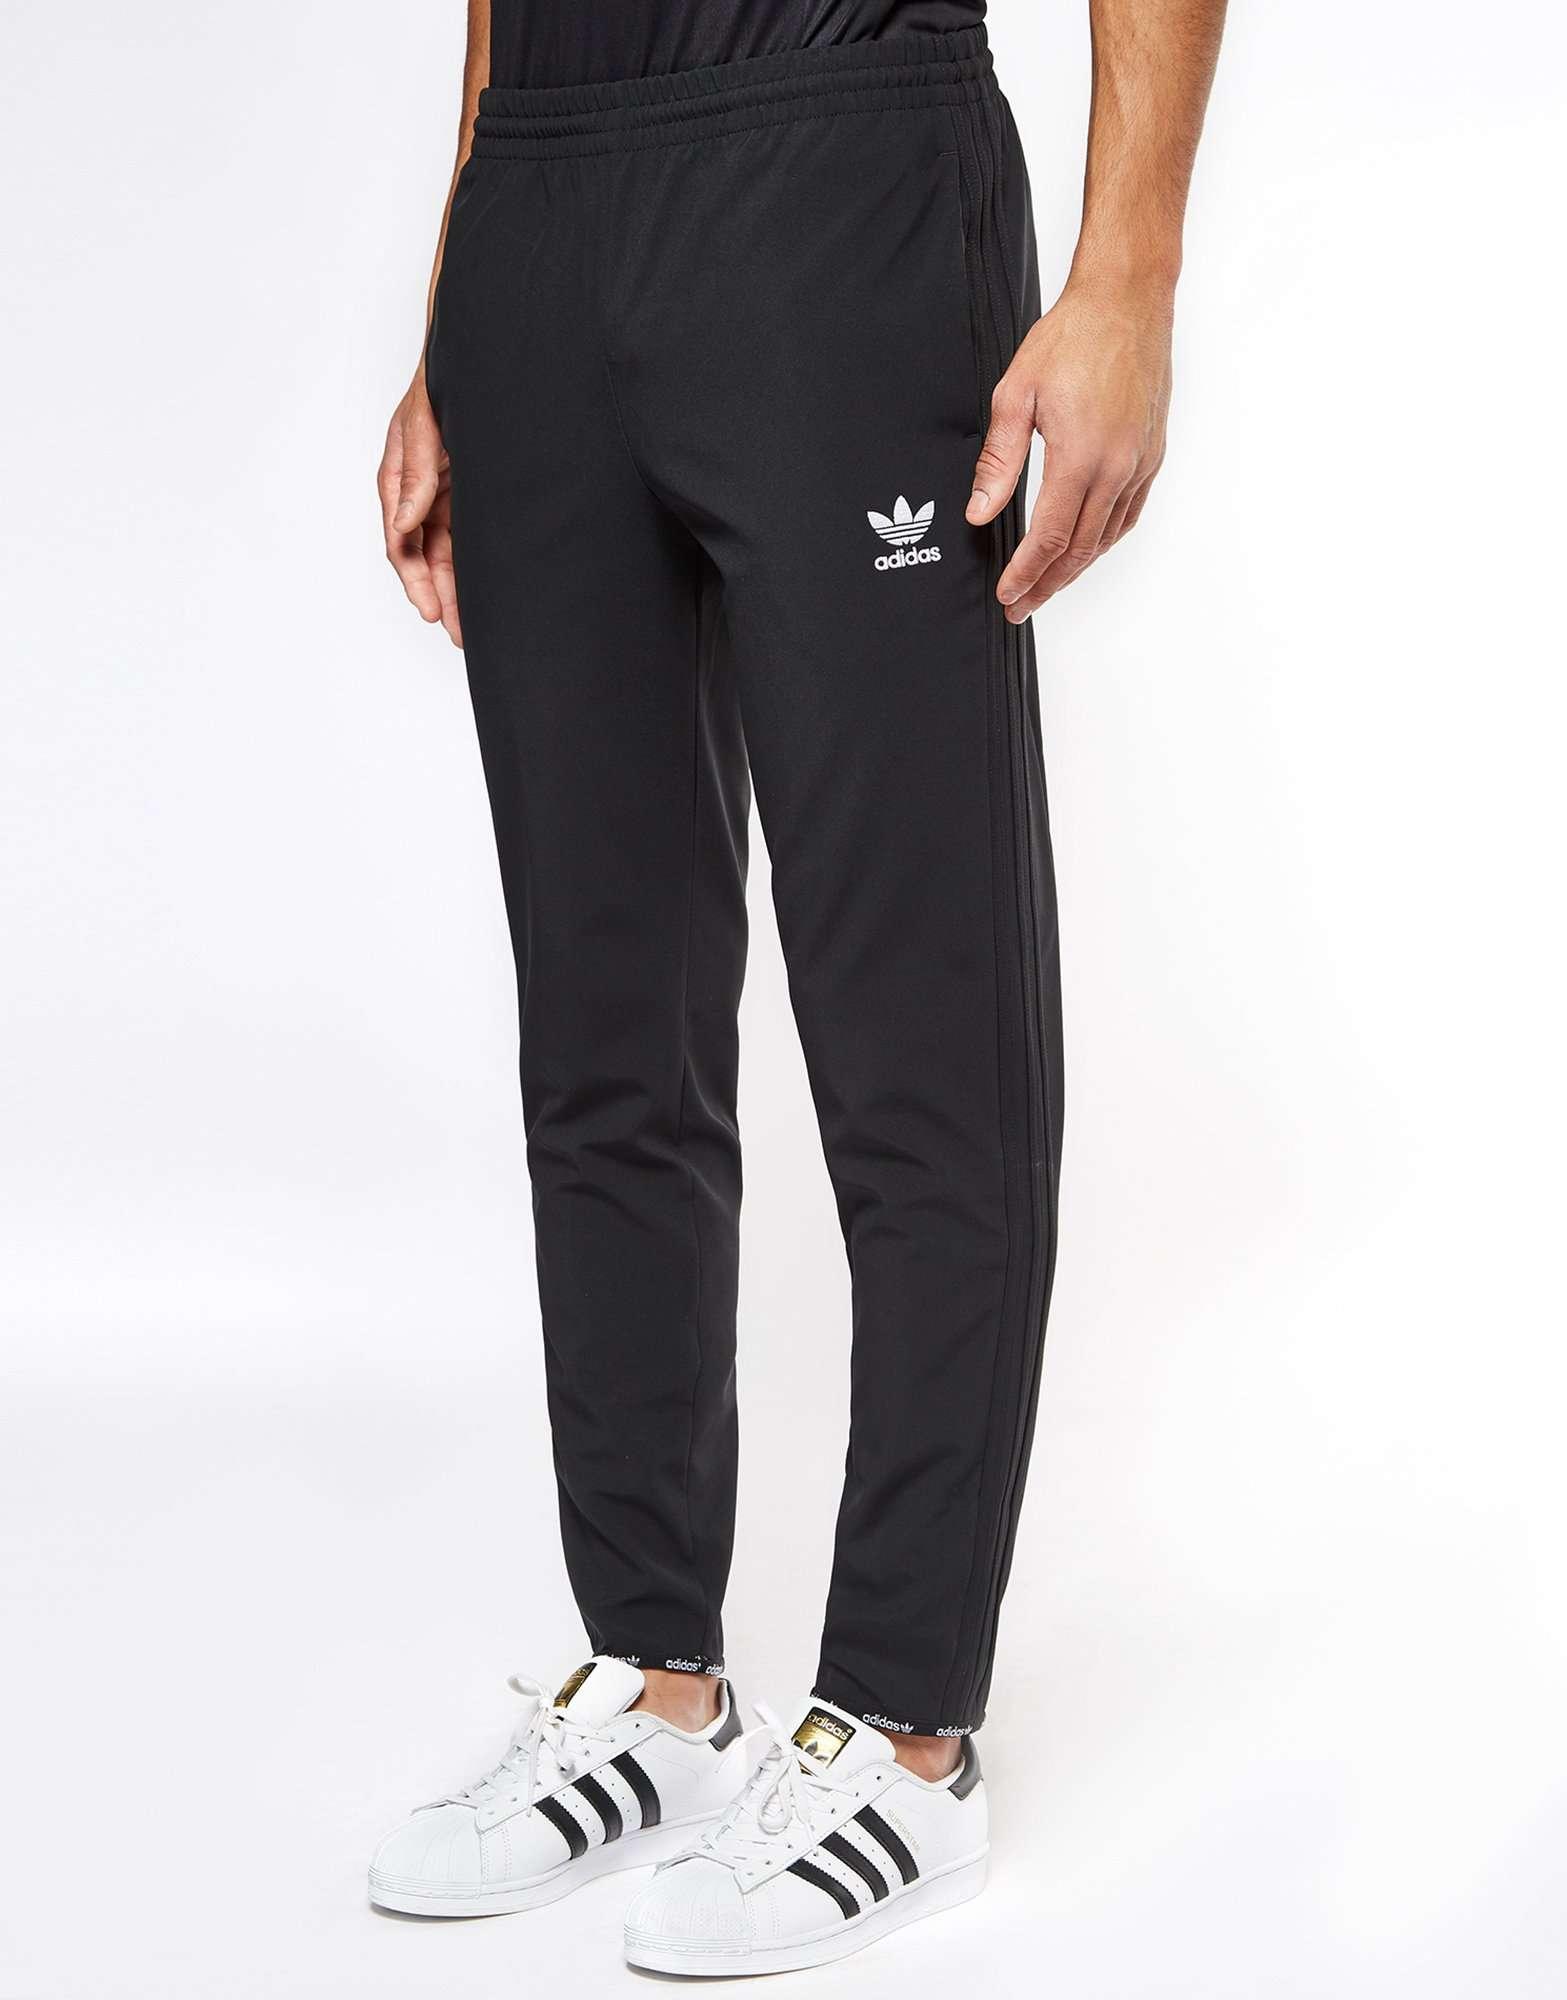 adidas Originals Superstar 2.0 Poly Track Pantalones negro